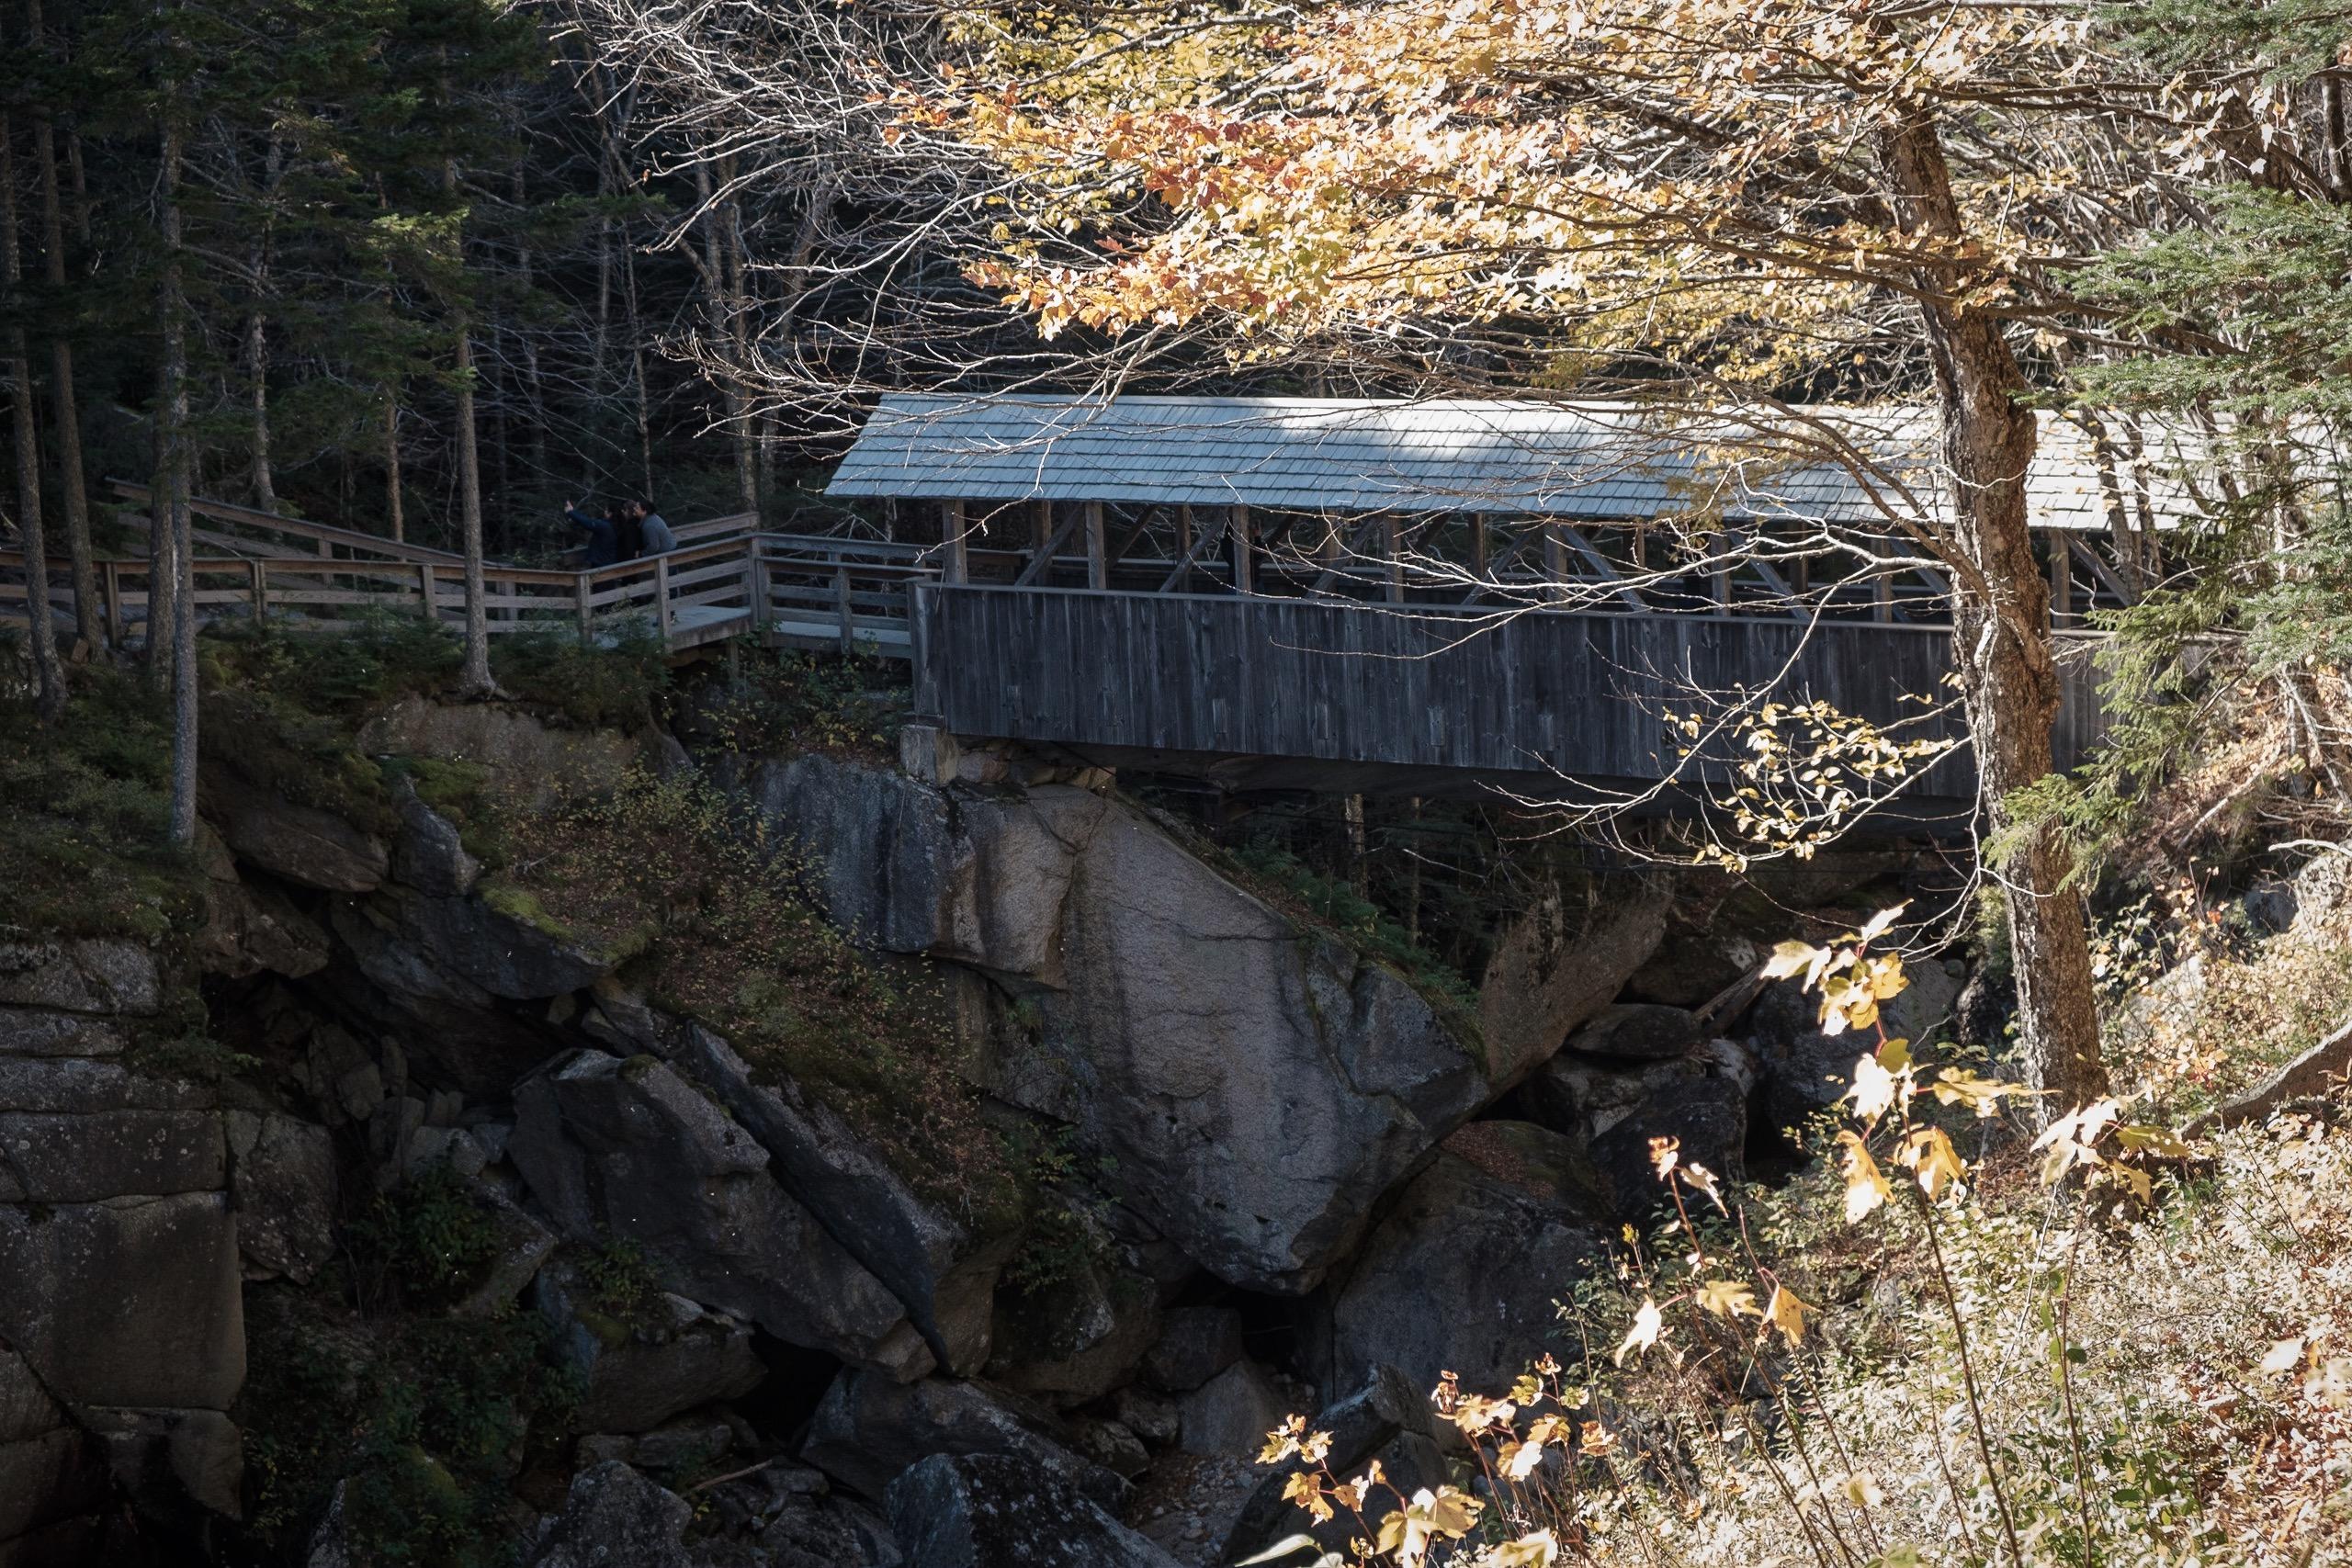 Covered bridge at the Pool